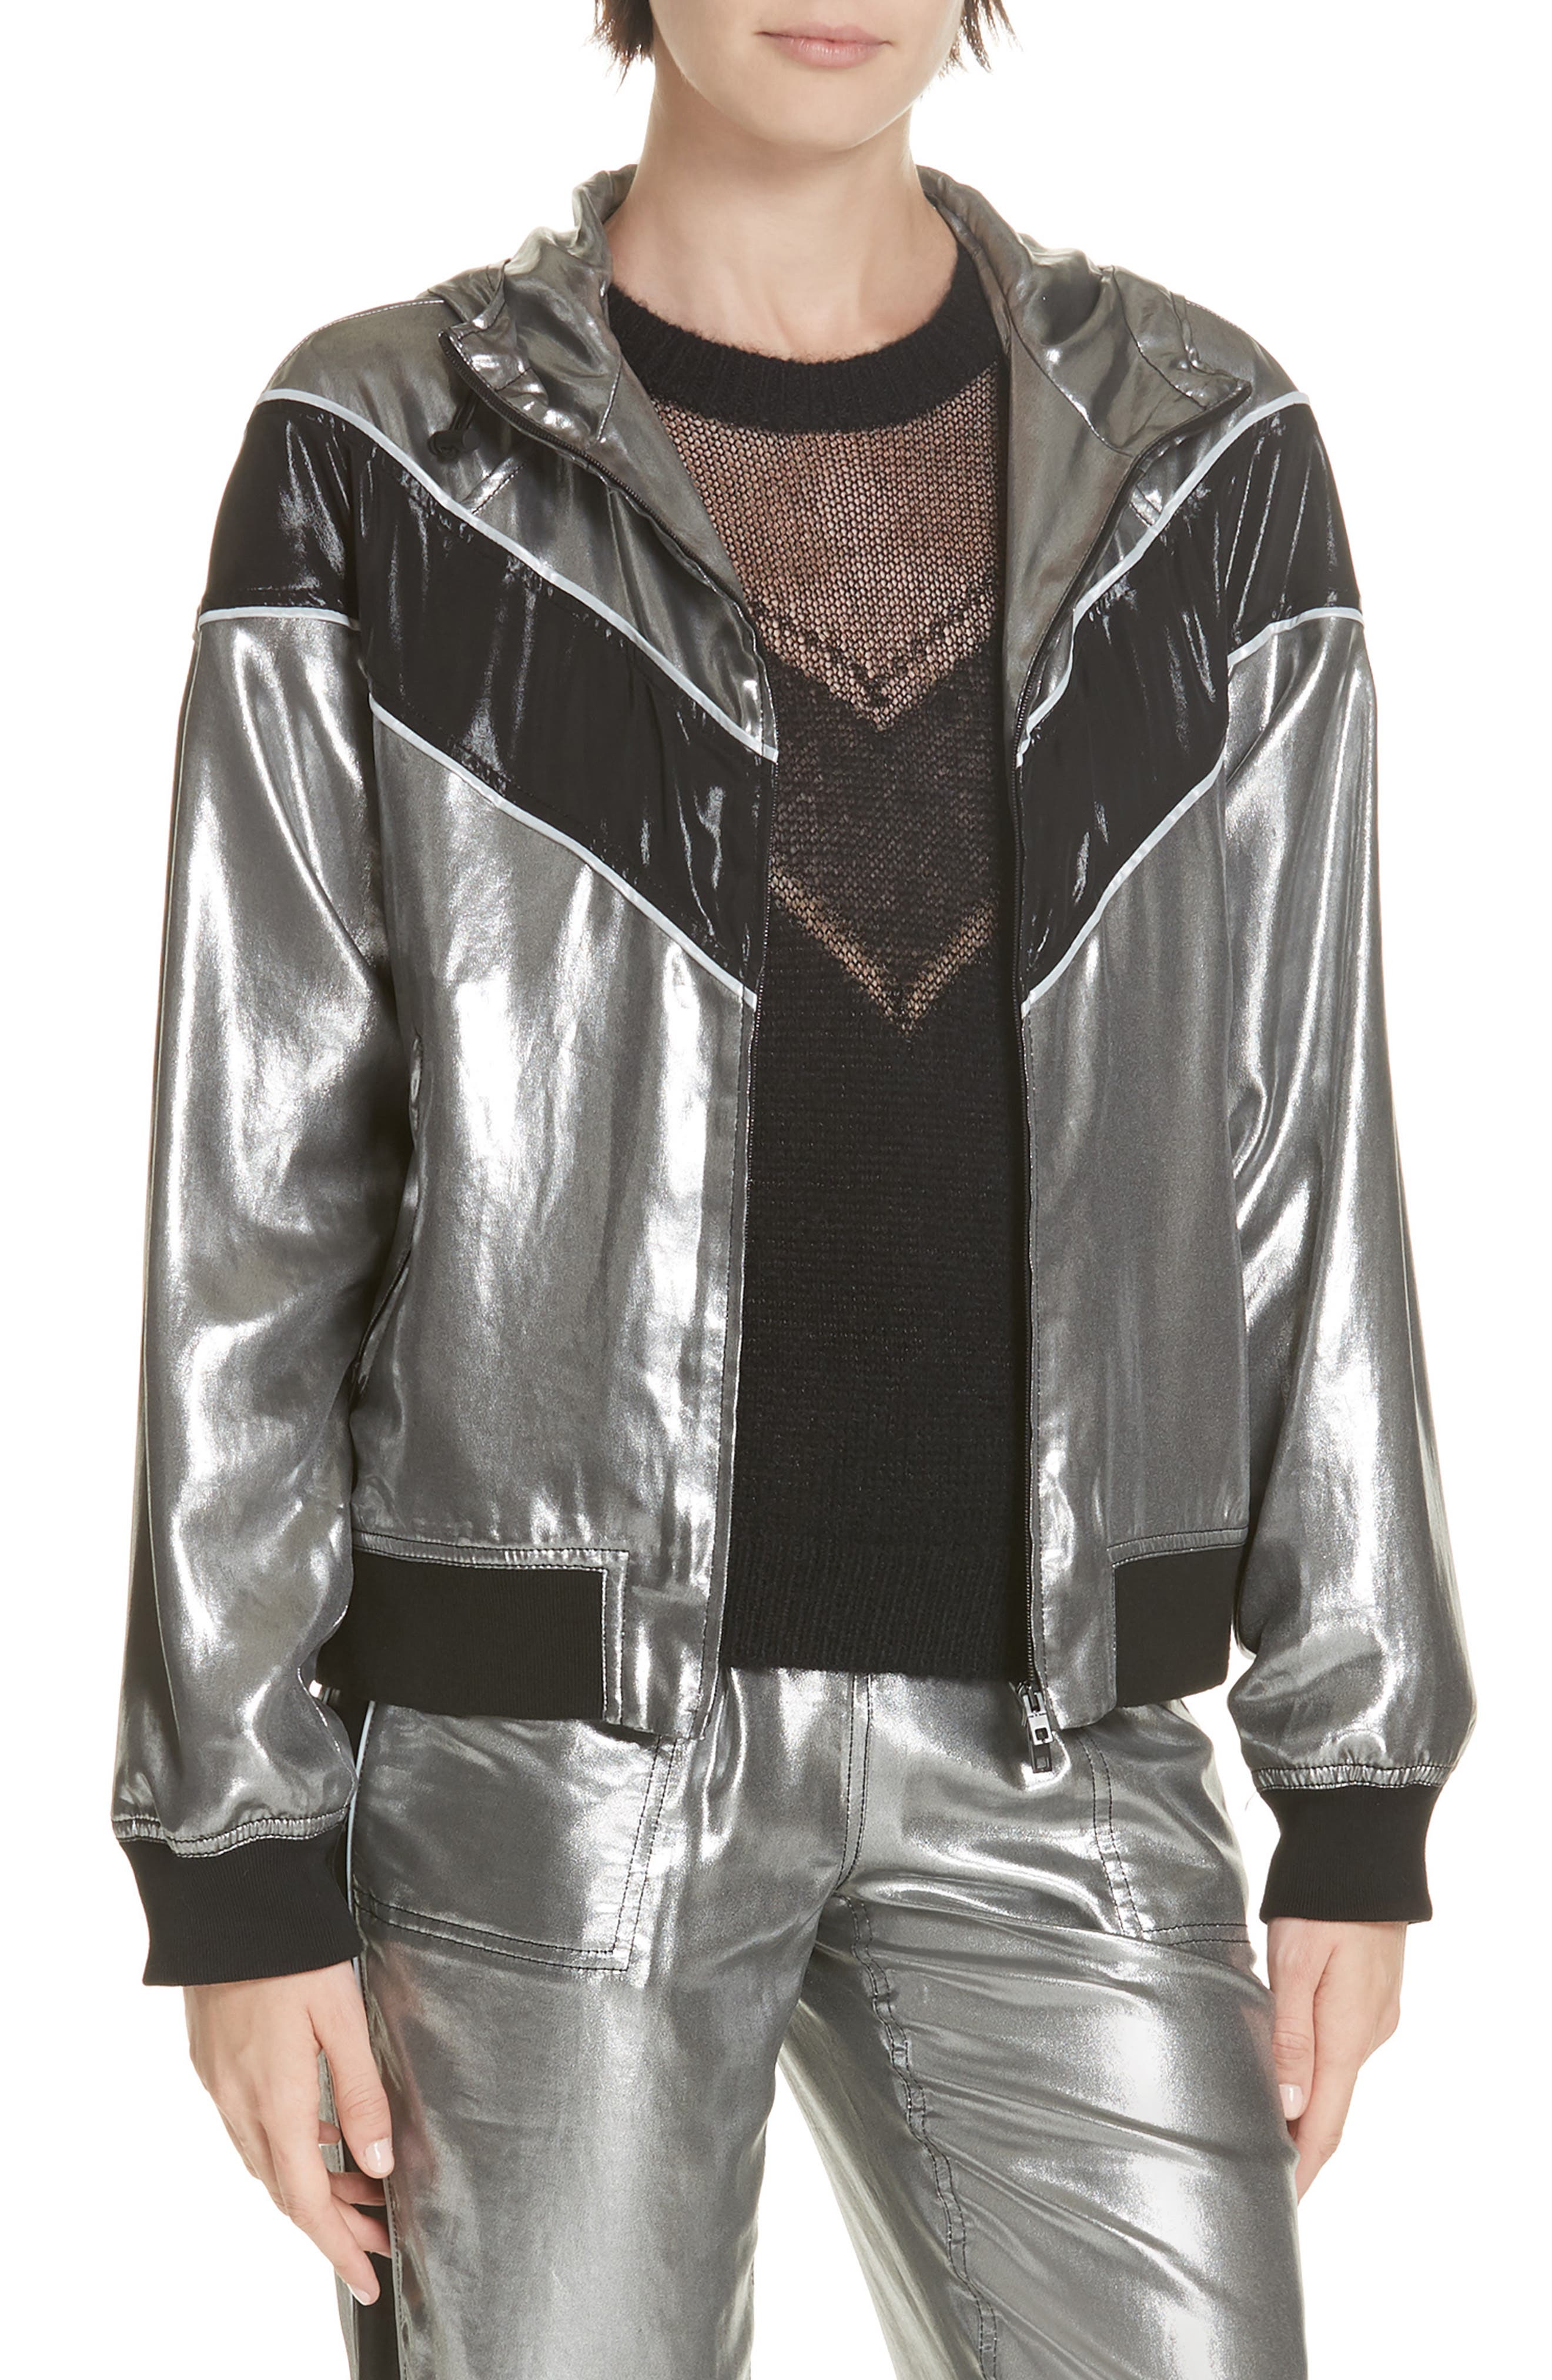 RAG & BONE Sloane Metallic Track Jacket, Main, color, SILVER/ BLACK